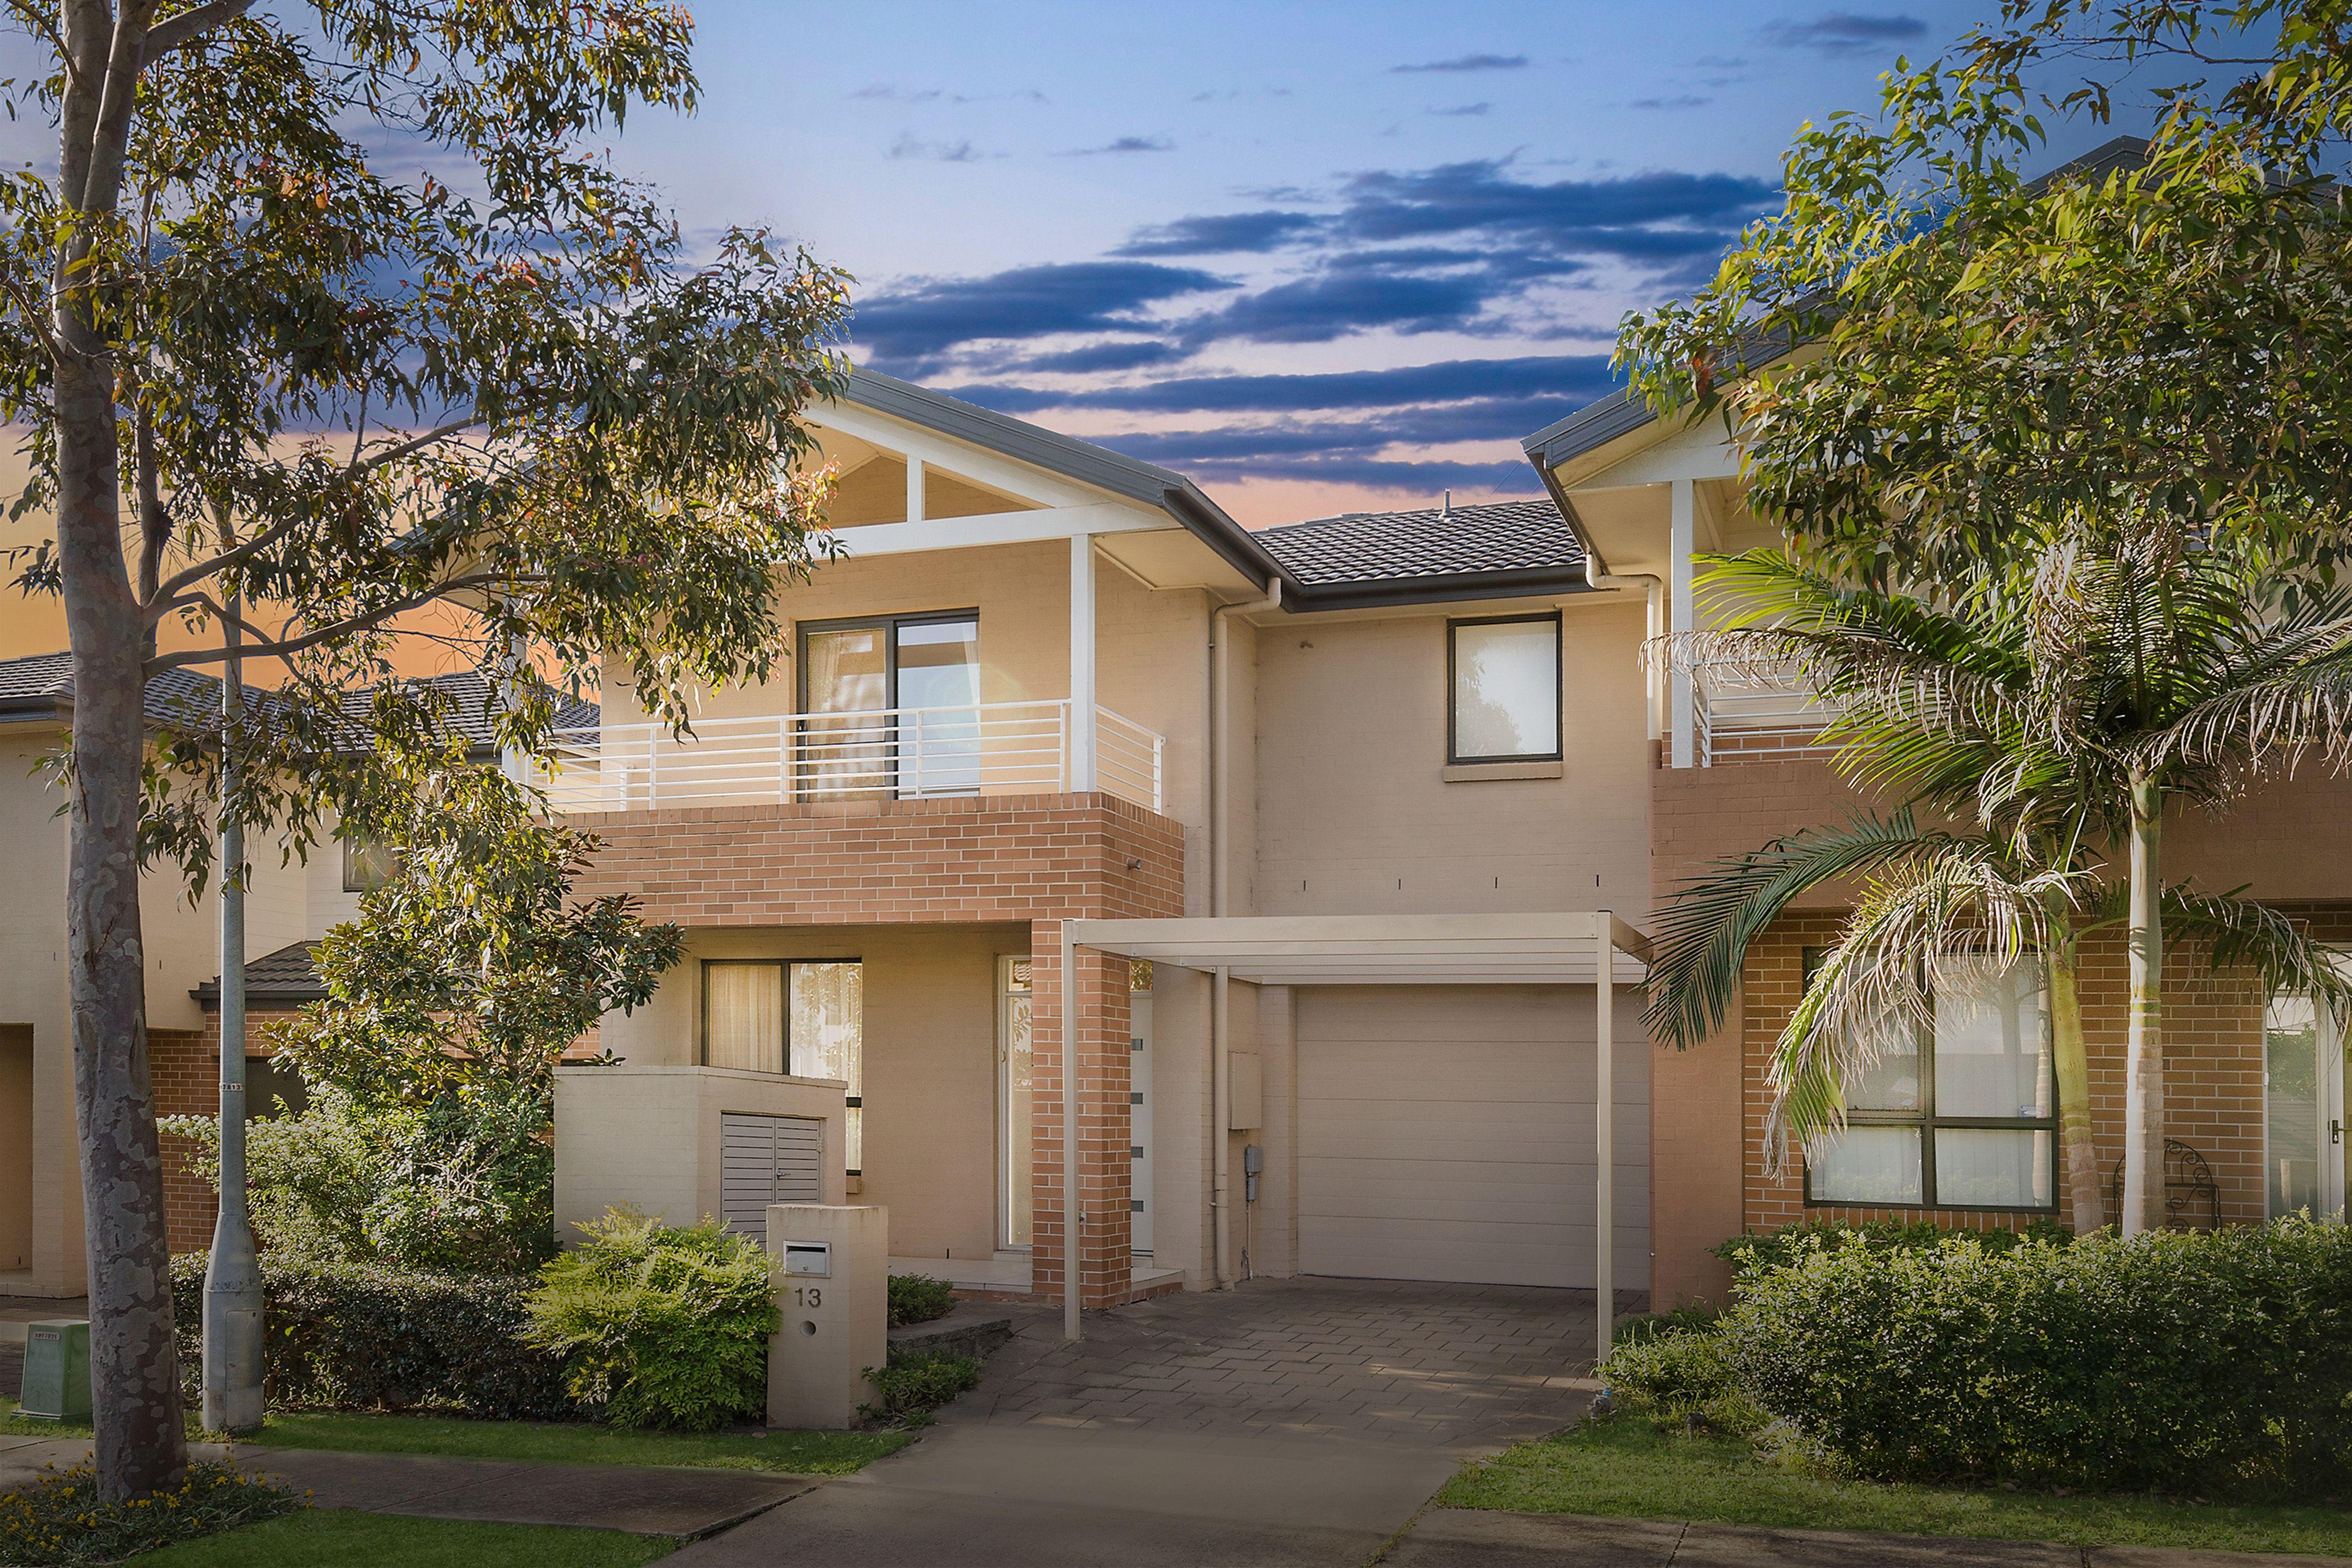 13 Wattle Crescent, Lidcombe NSW 2141